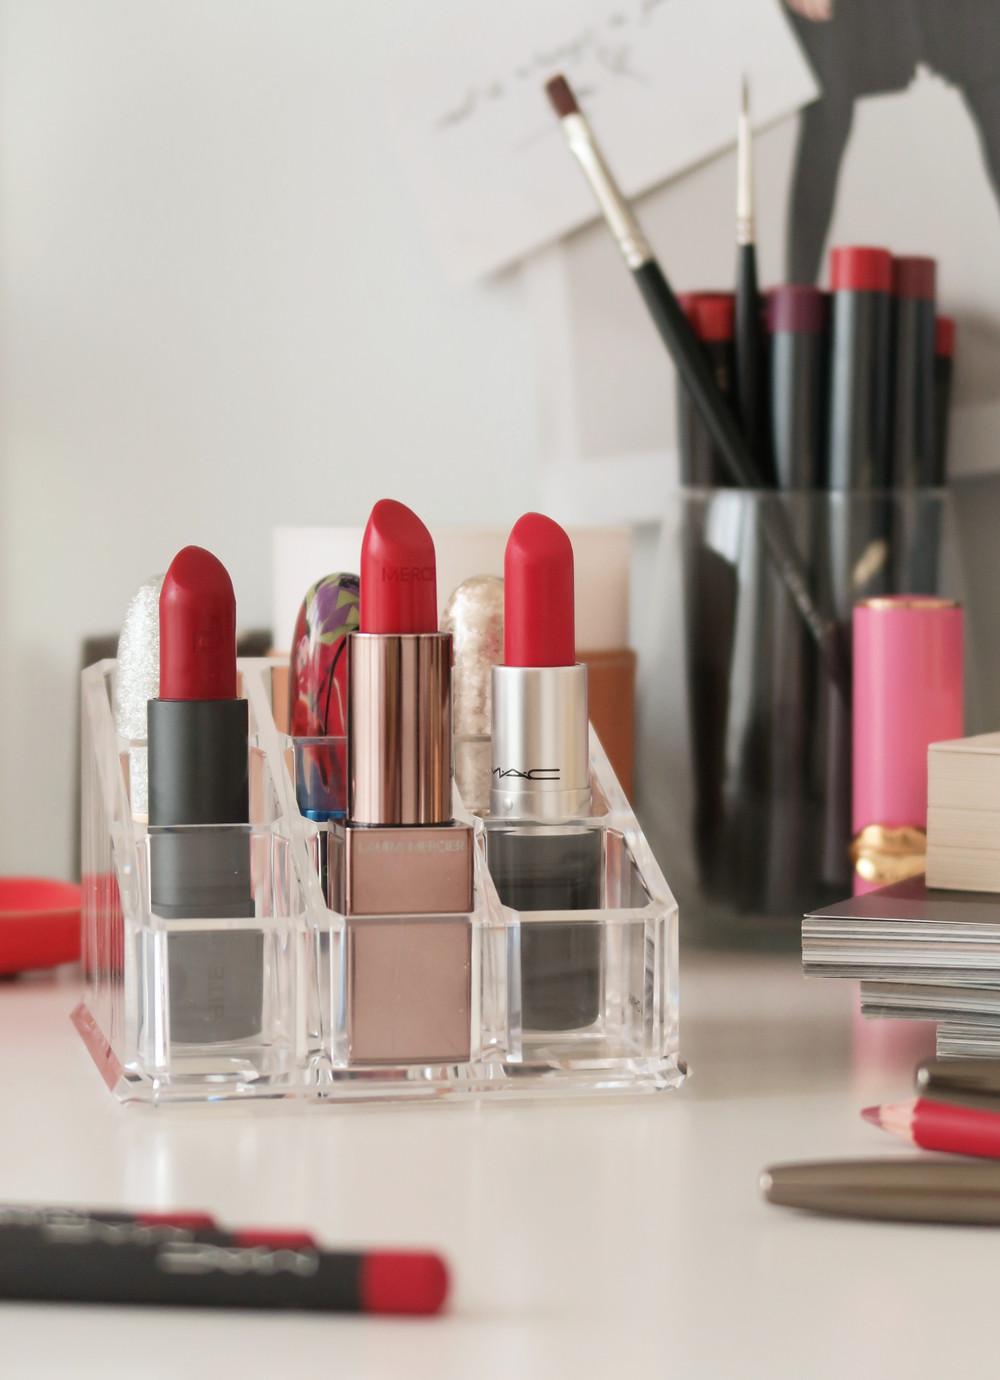 laura mercier rouge essentiel lipstick review